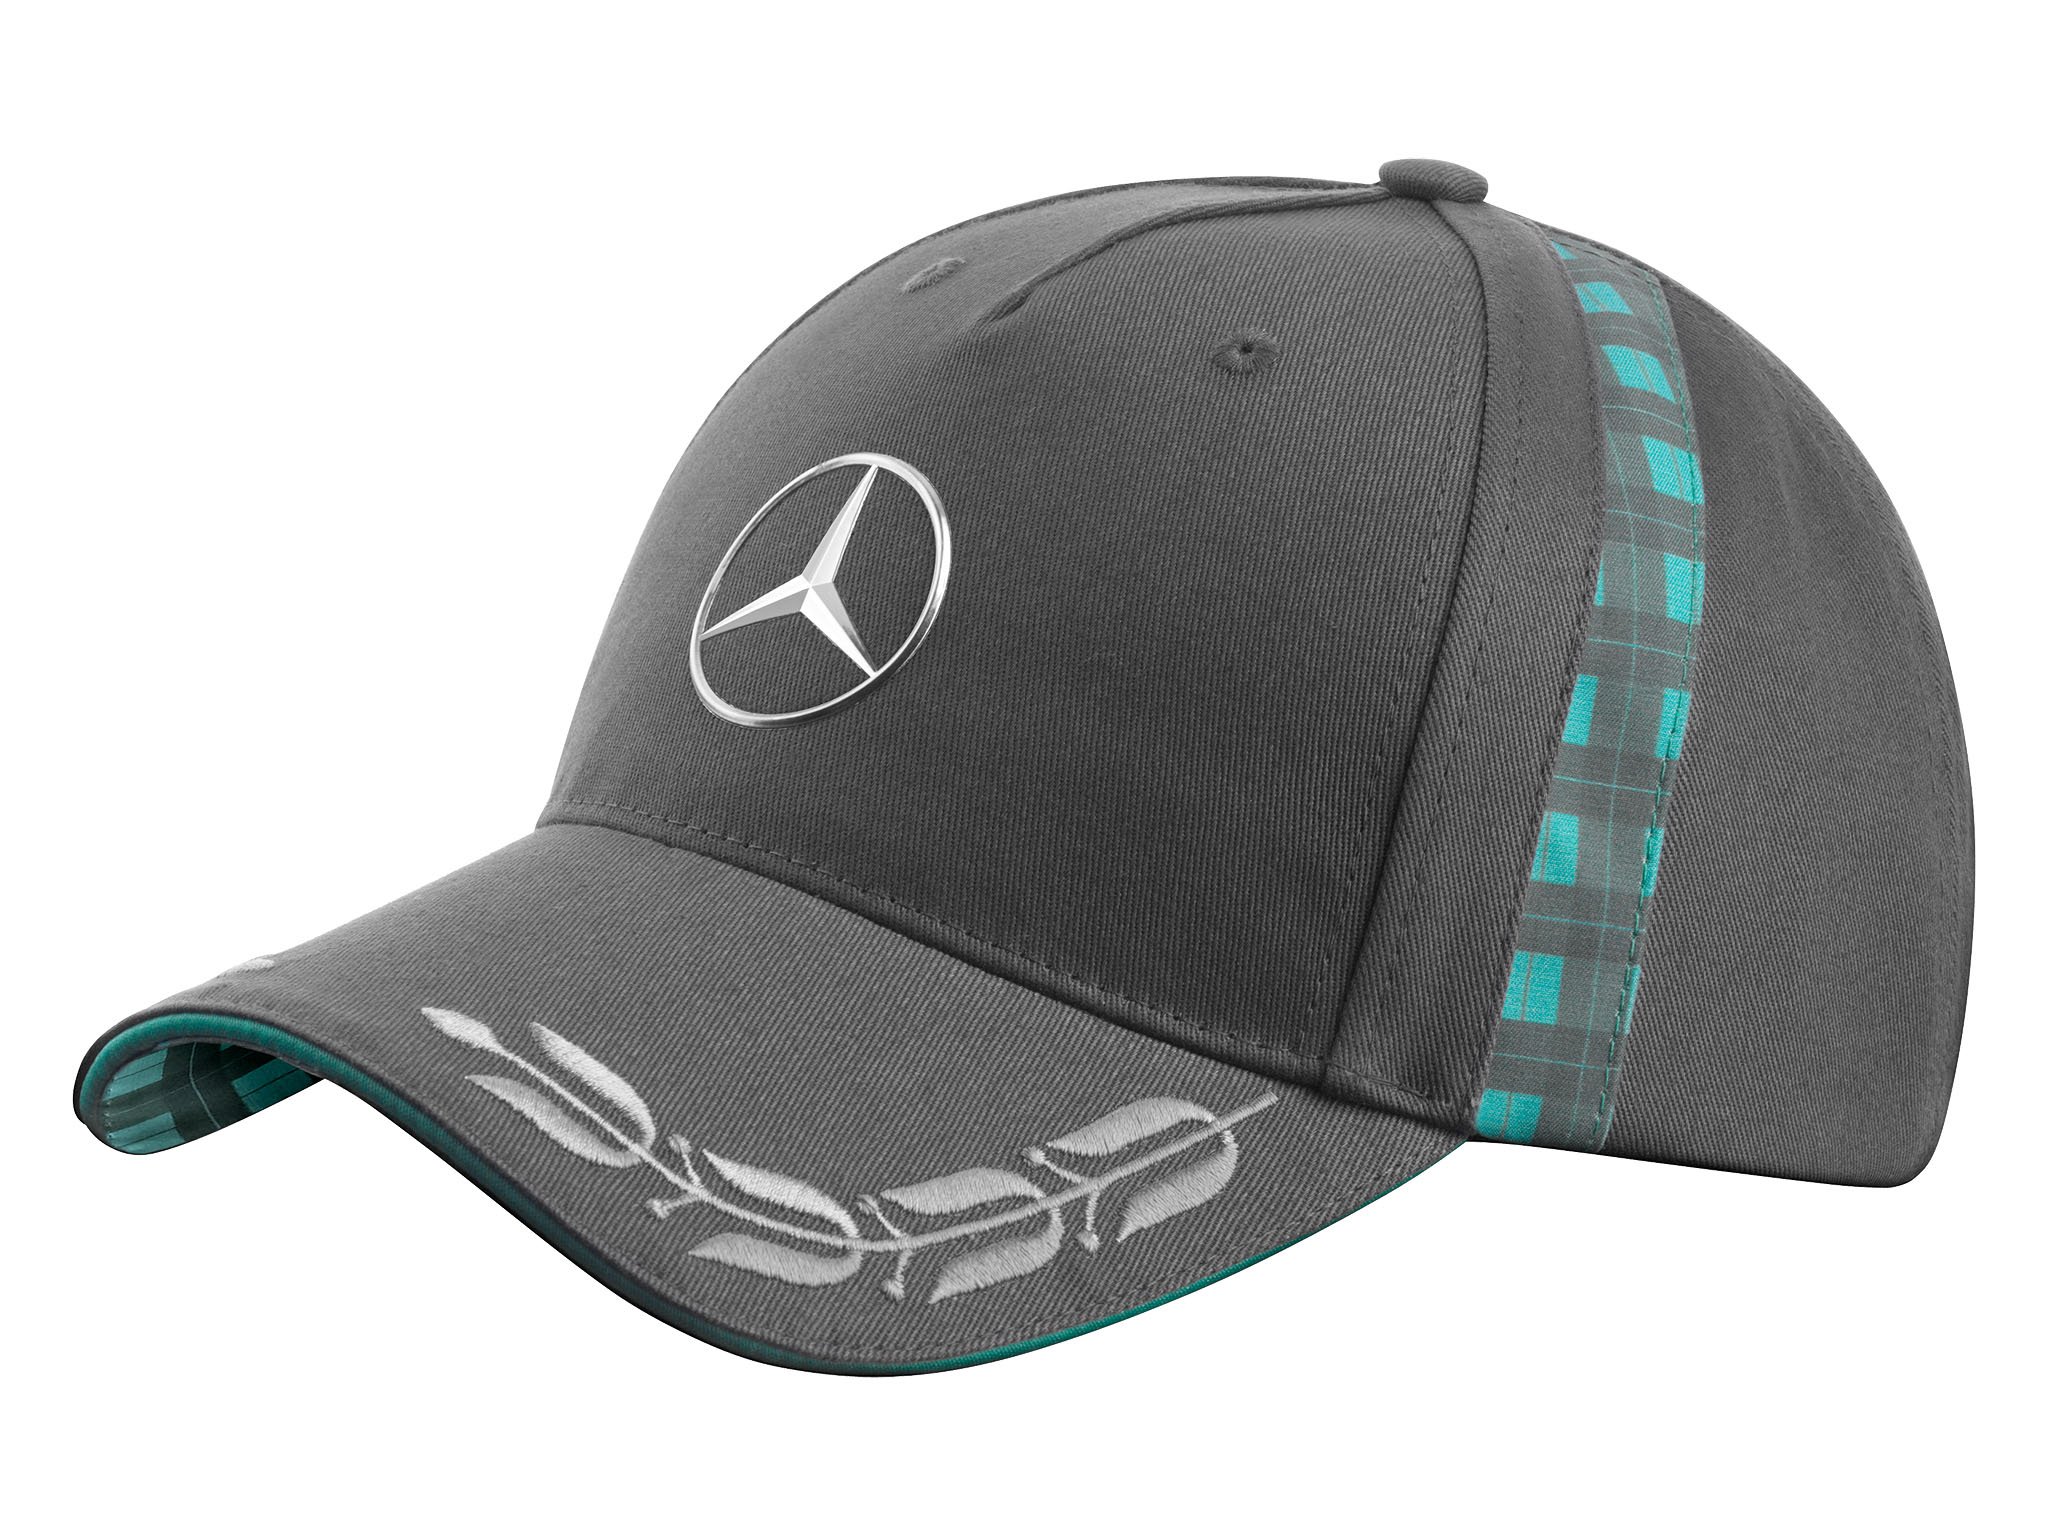 Baseballcap heritage heren mercedes benz official for Mercedes benz caps hats